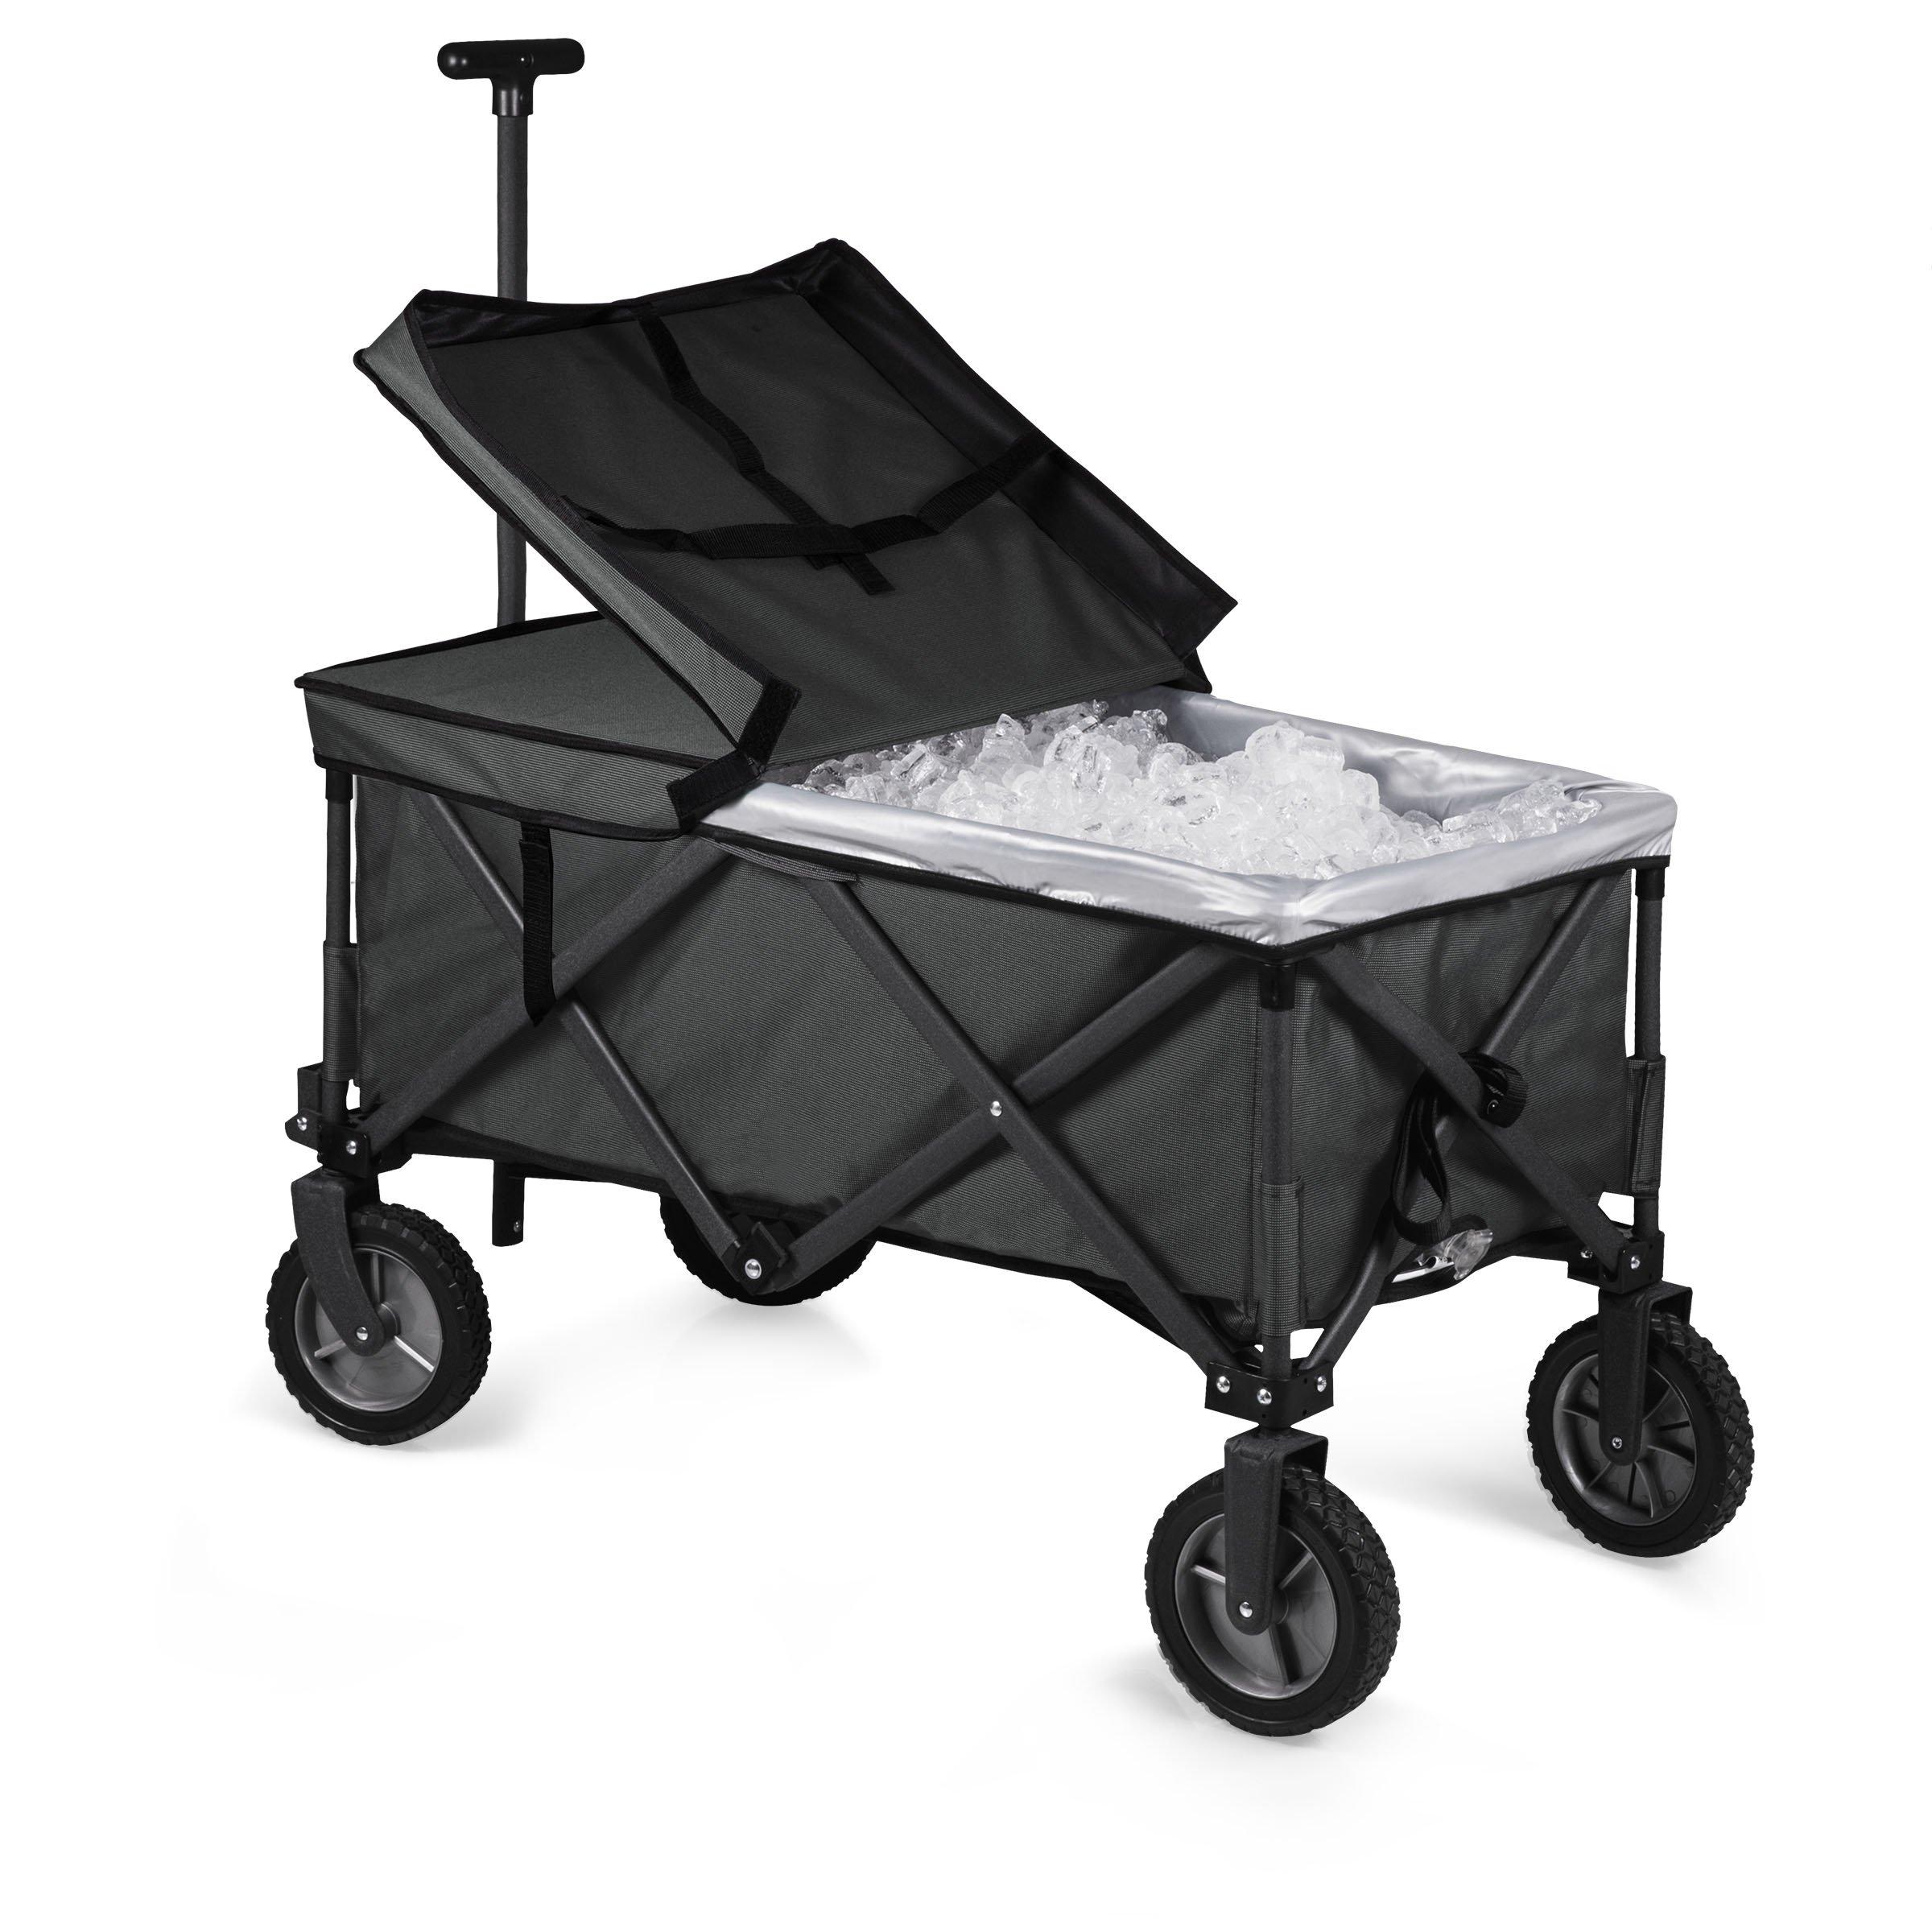 Picnic Time Collapsible Adventure Wagon Elite, Black/Gray